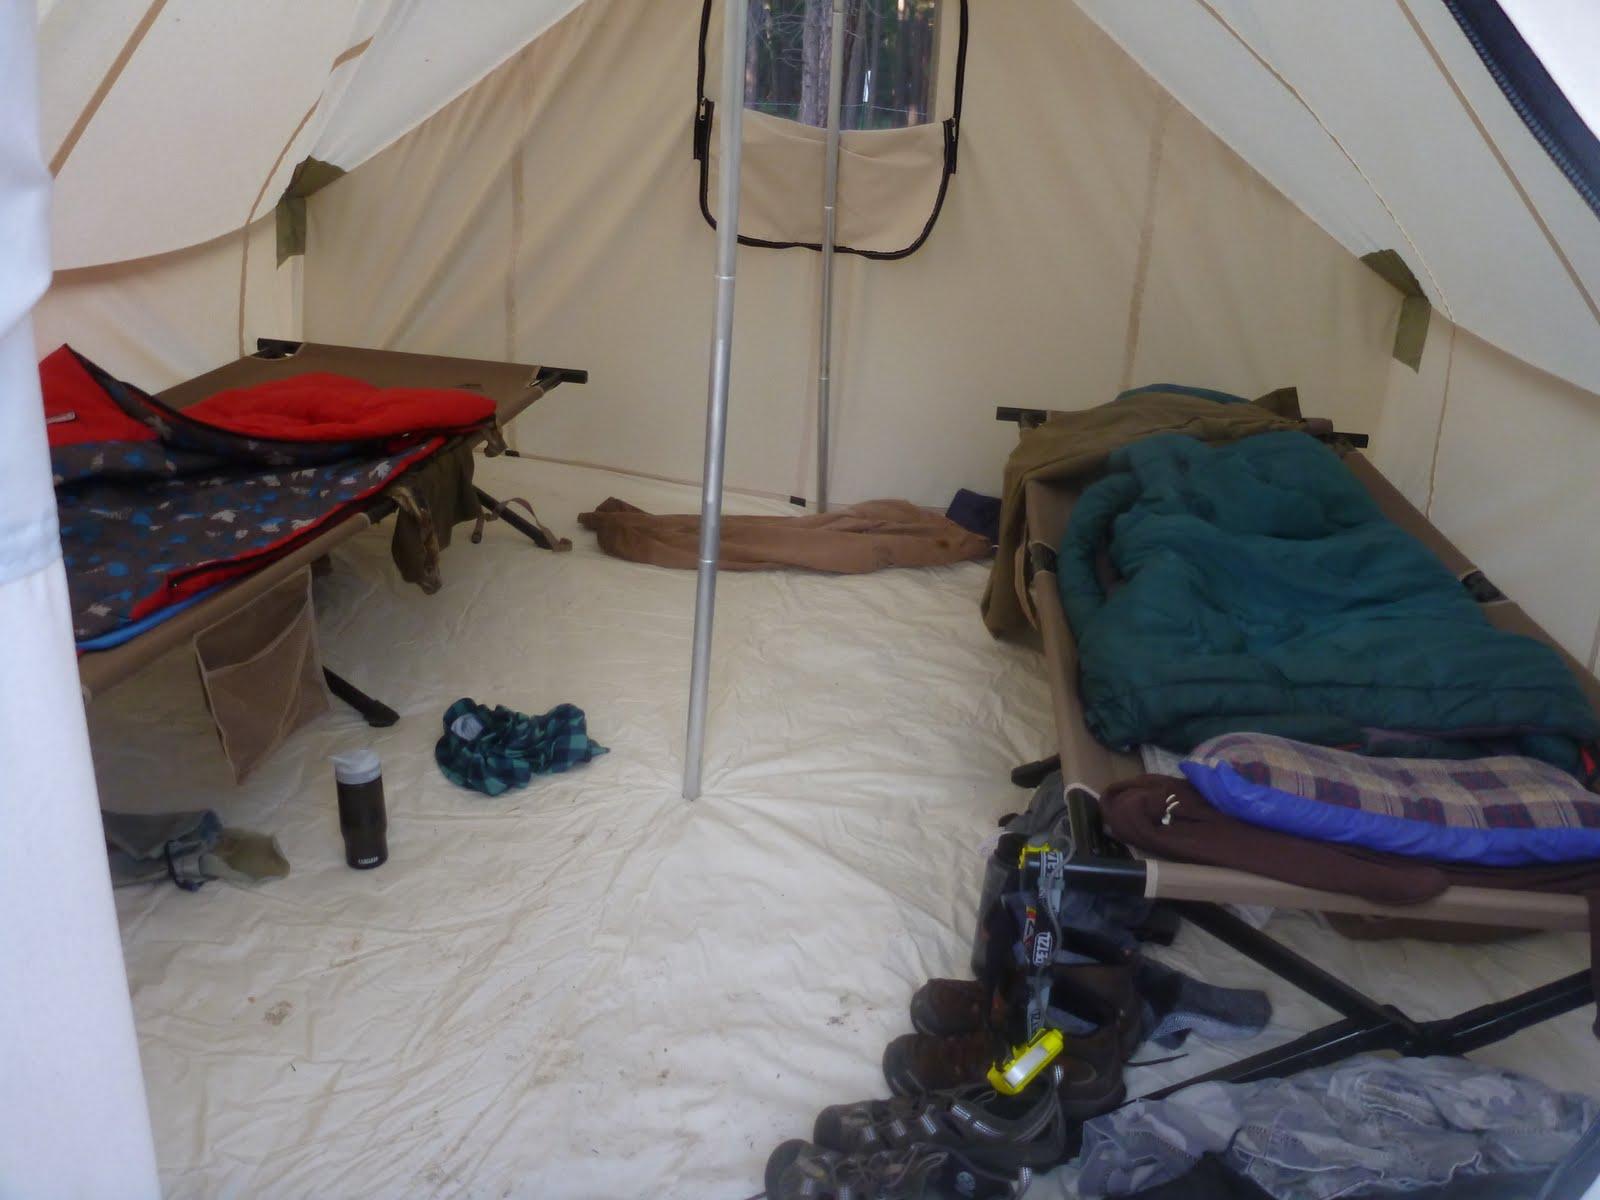 Reliable Tent Co Teton Tent